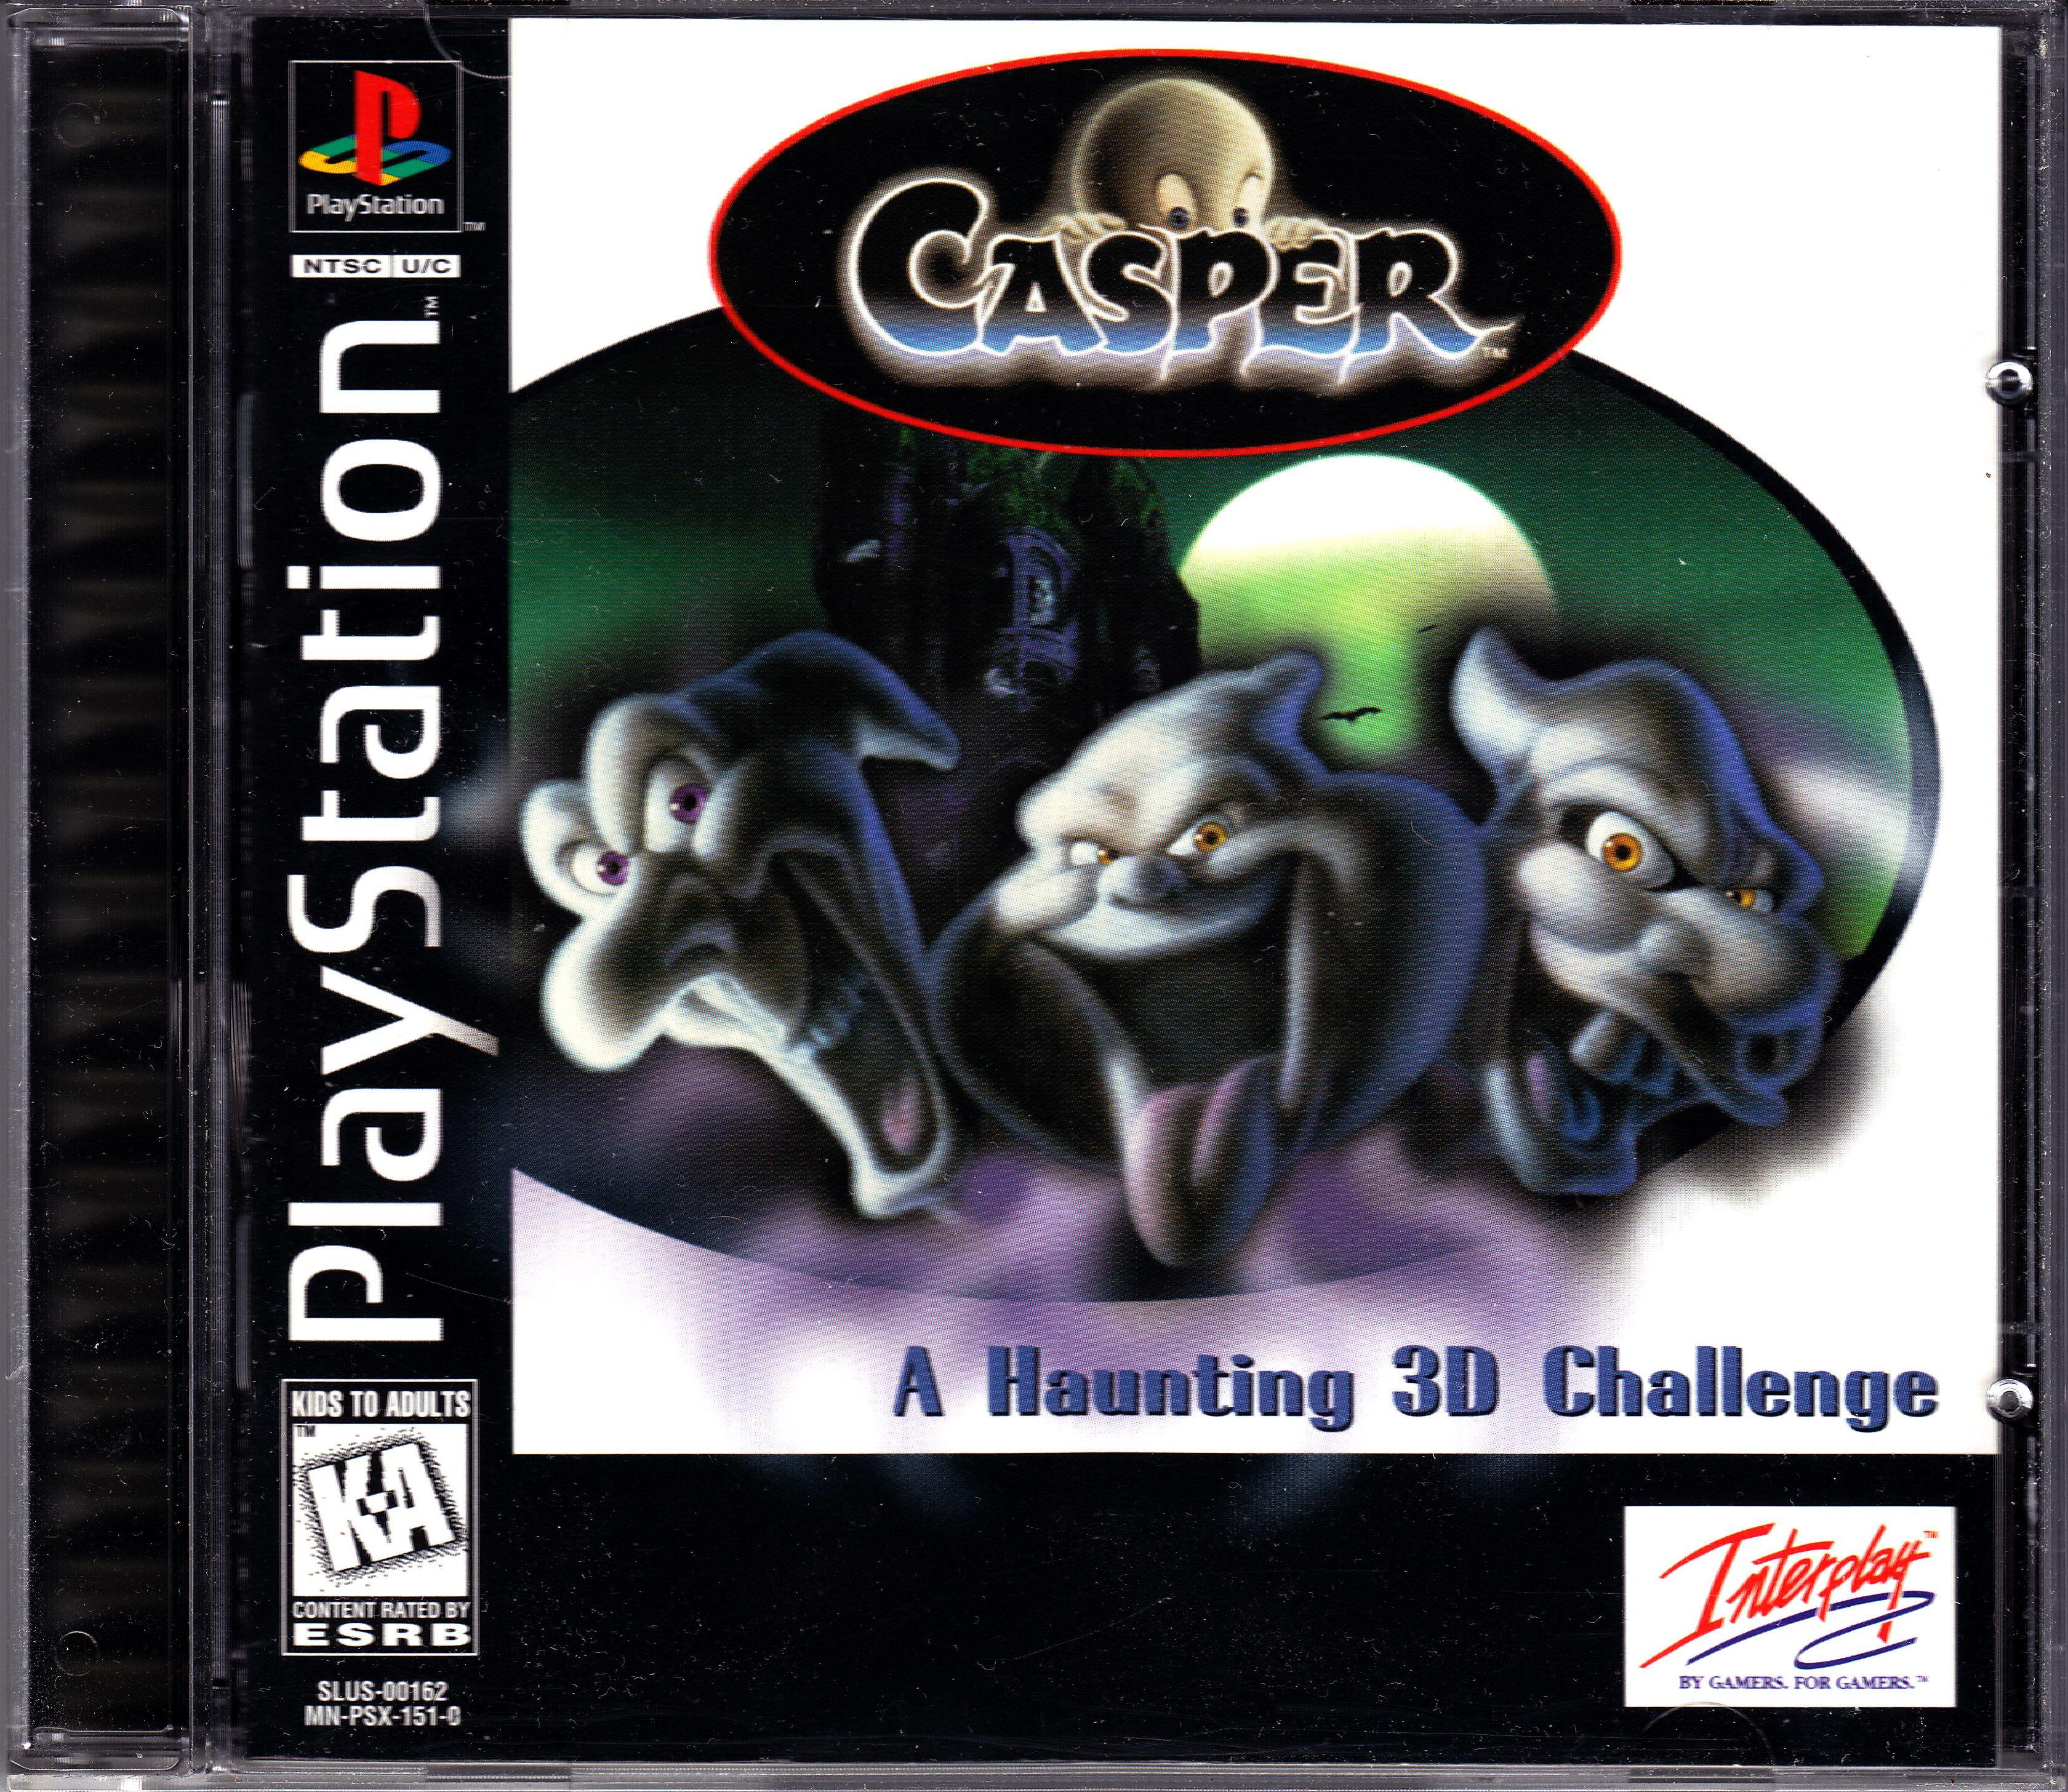 Casper Playstation Casper Game Black